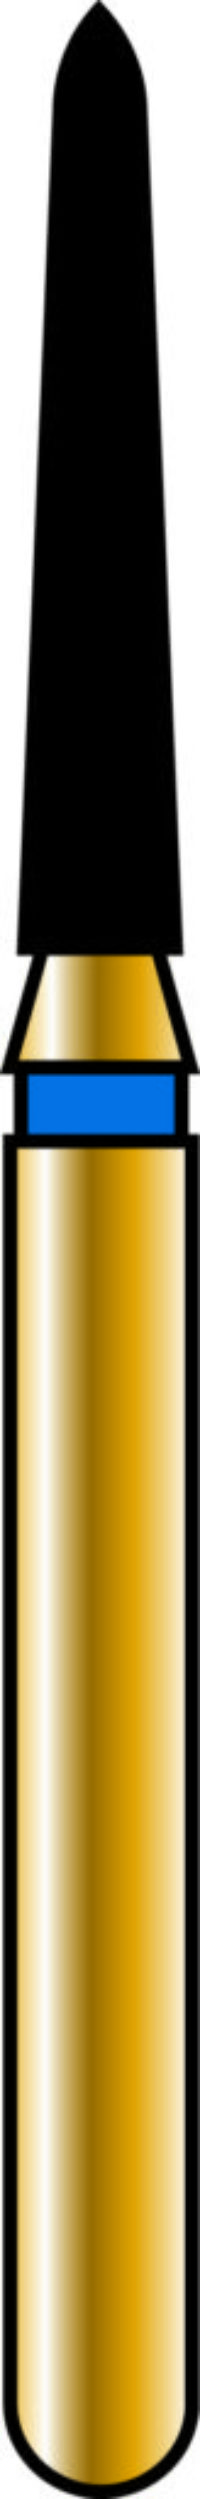 Pointed Taper 14-8mm Gold Diamond Bur